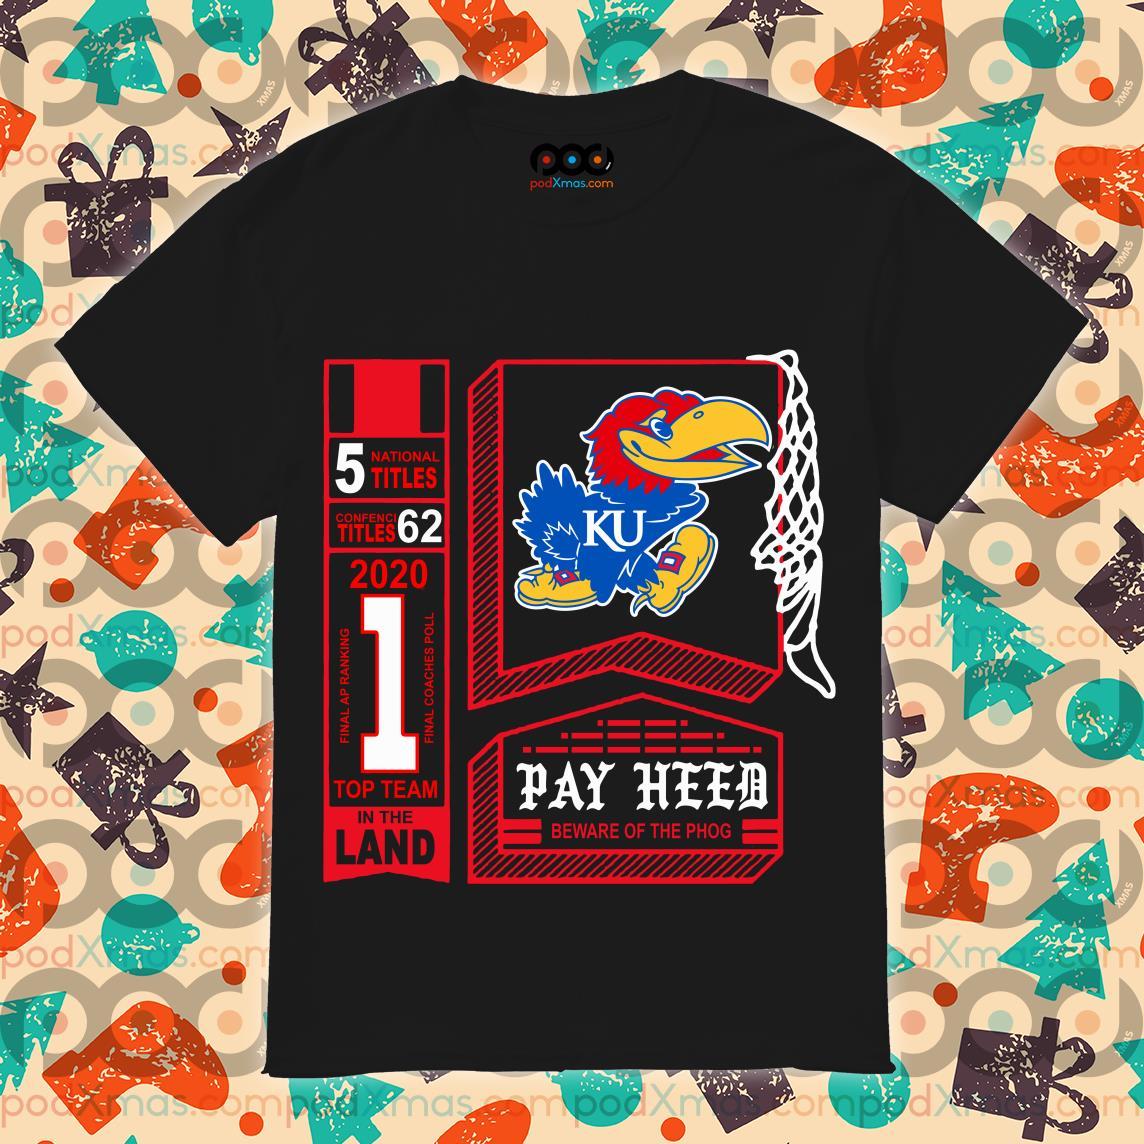 Kansas Jayhawks Pay Heed beware of the Phog T-shirt